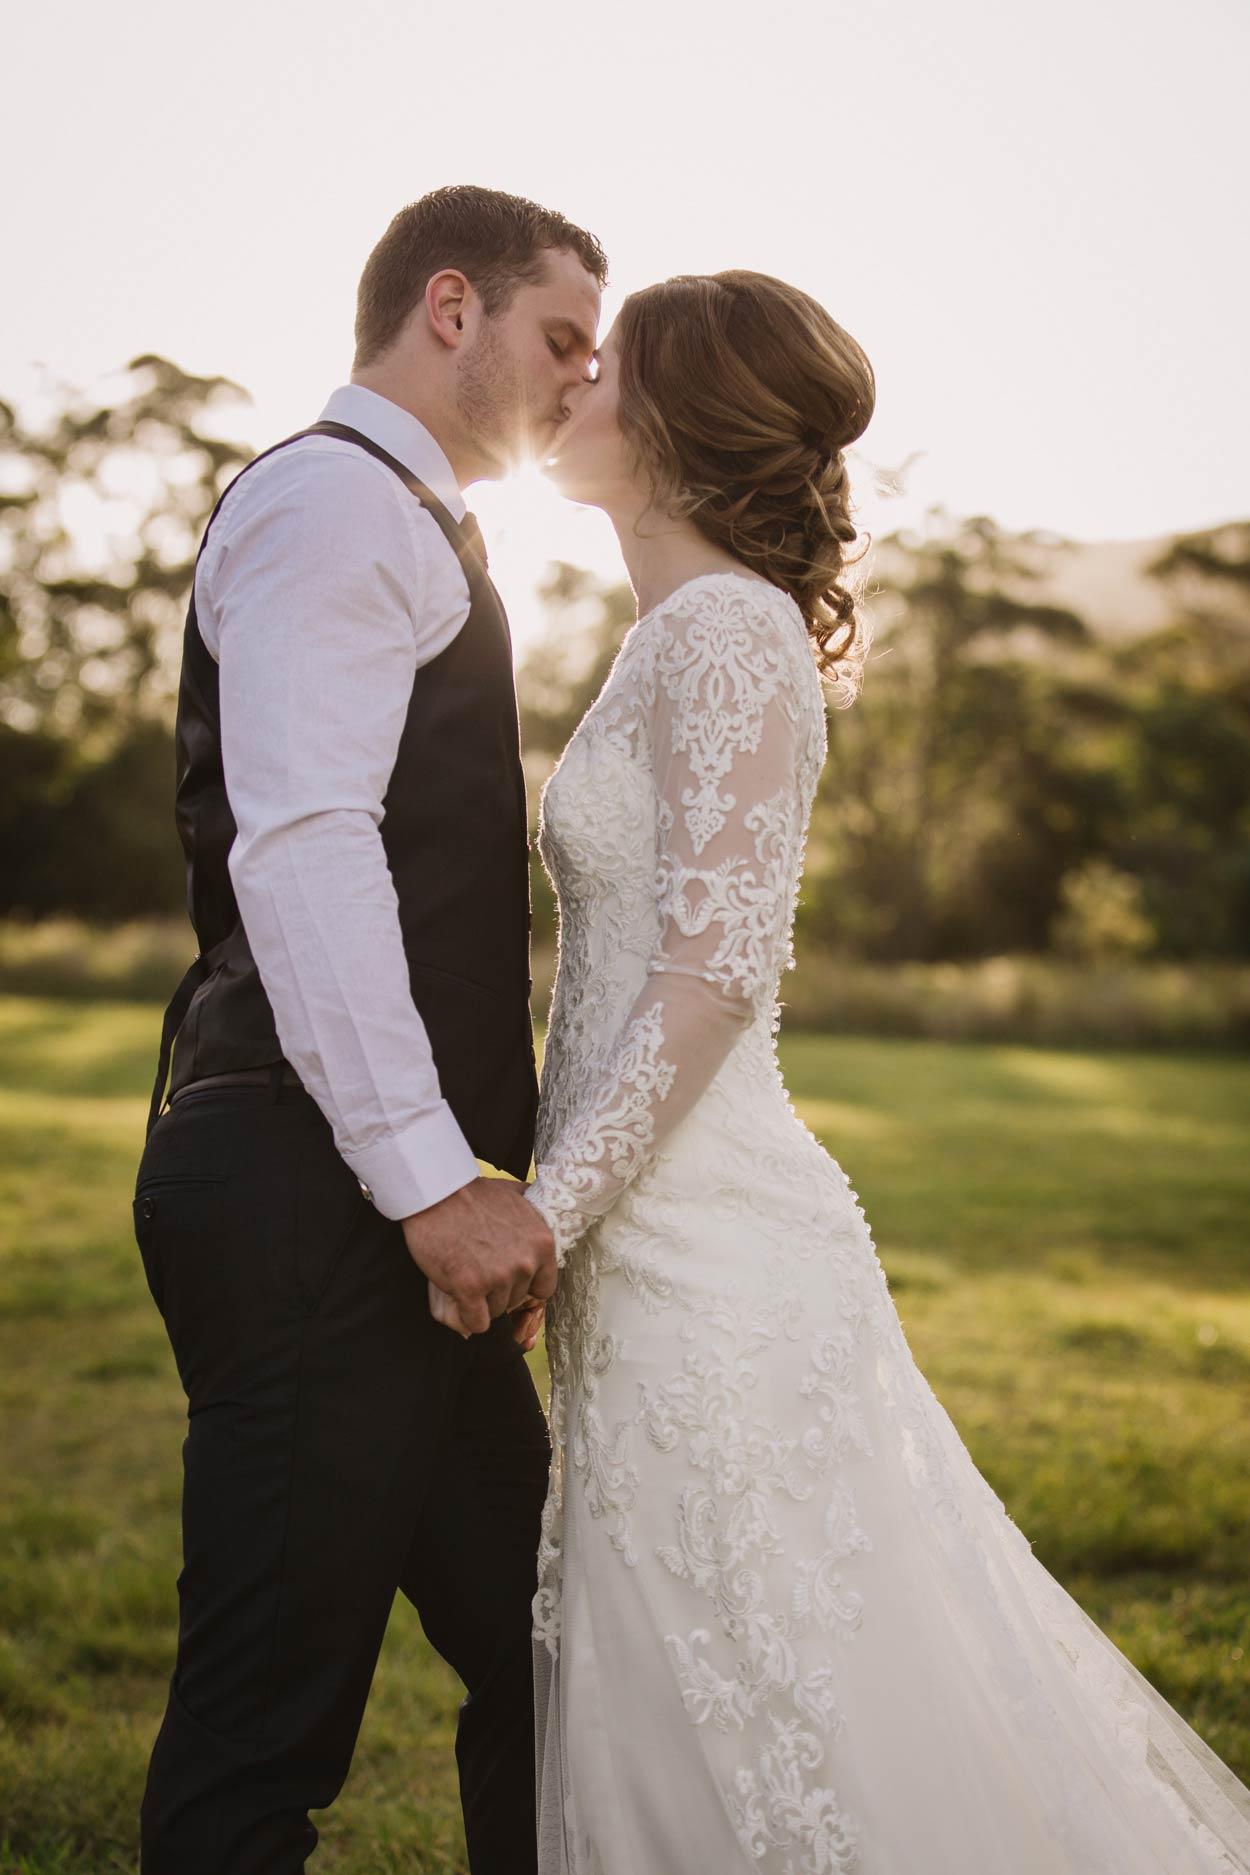 Cooroy Eco Wedding Destination Photographer - Brisbane, Sunshine Coast, Australian Blog